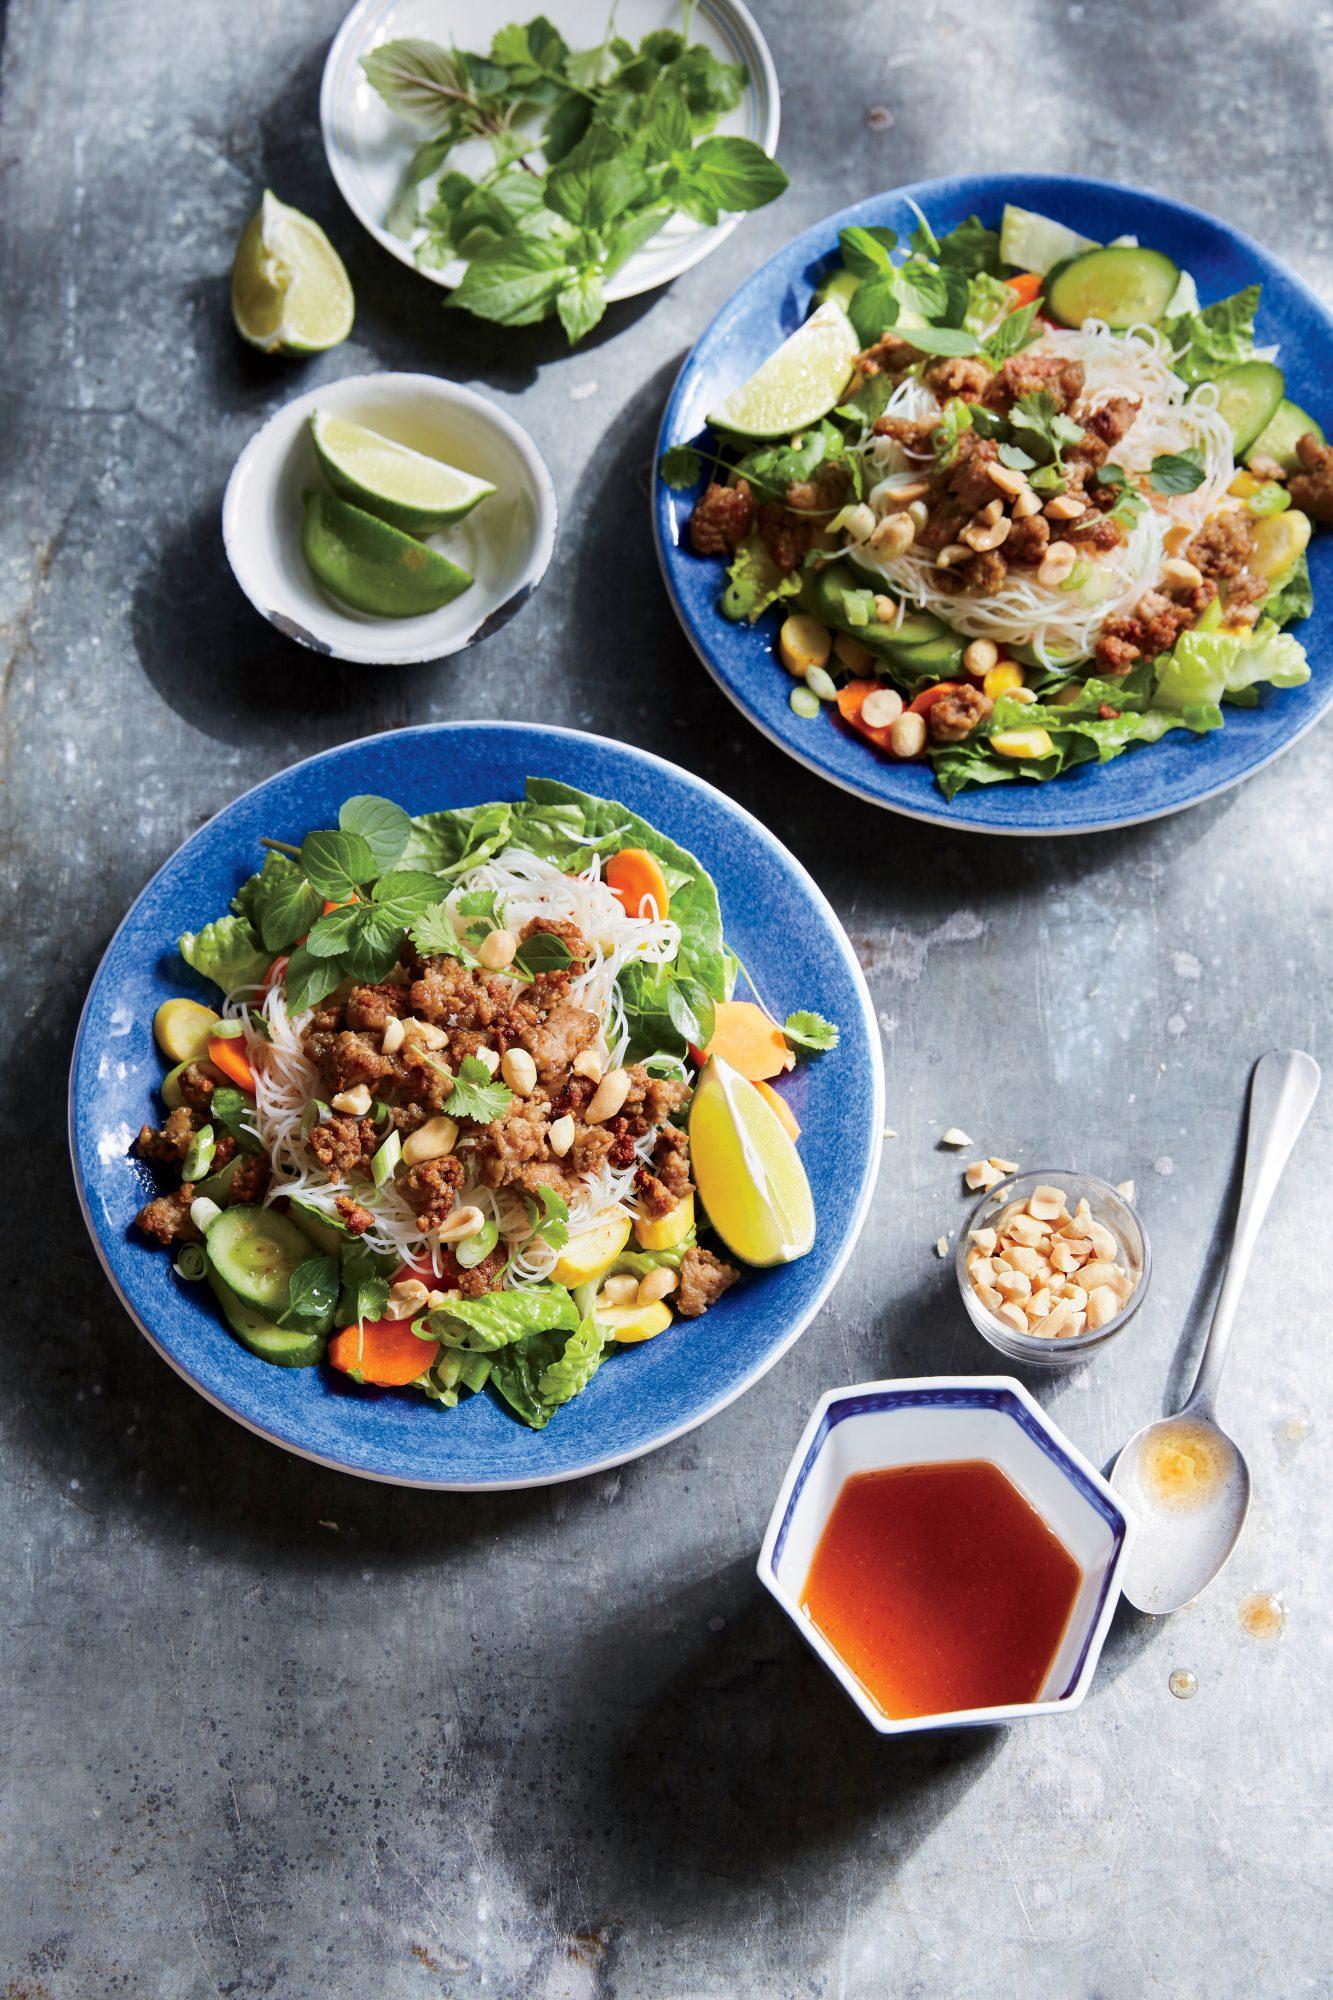 Cold pork salad recipe